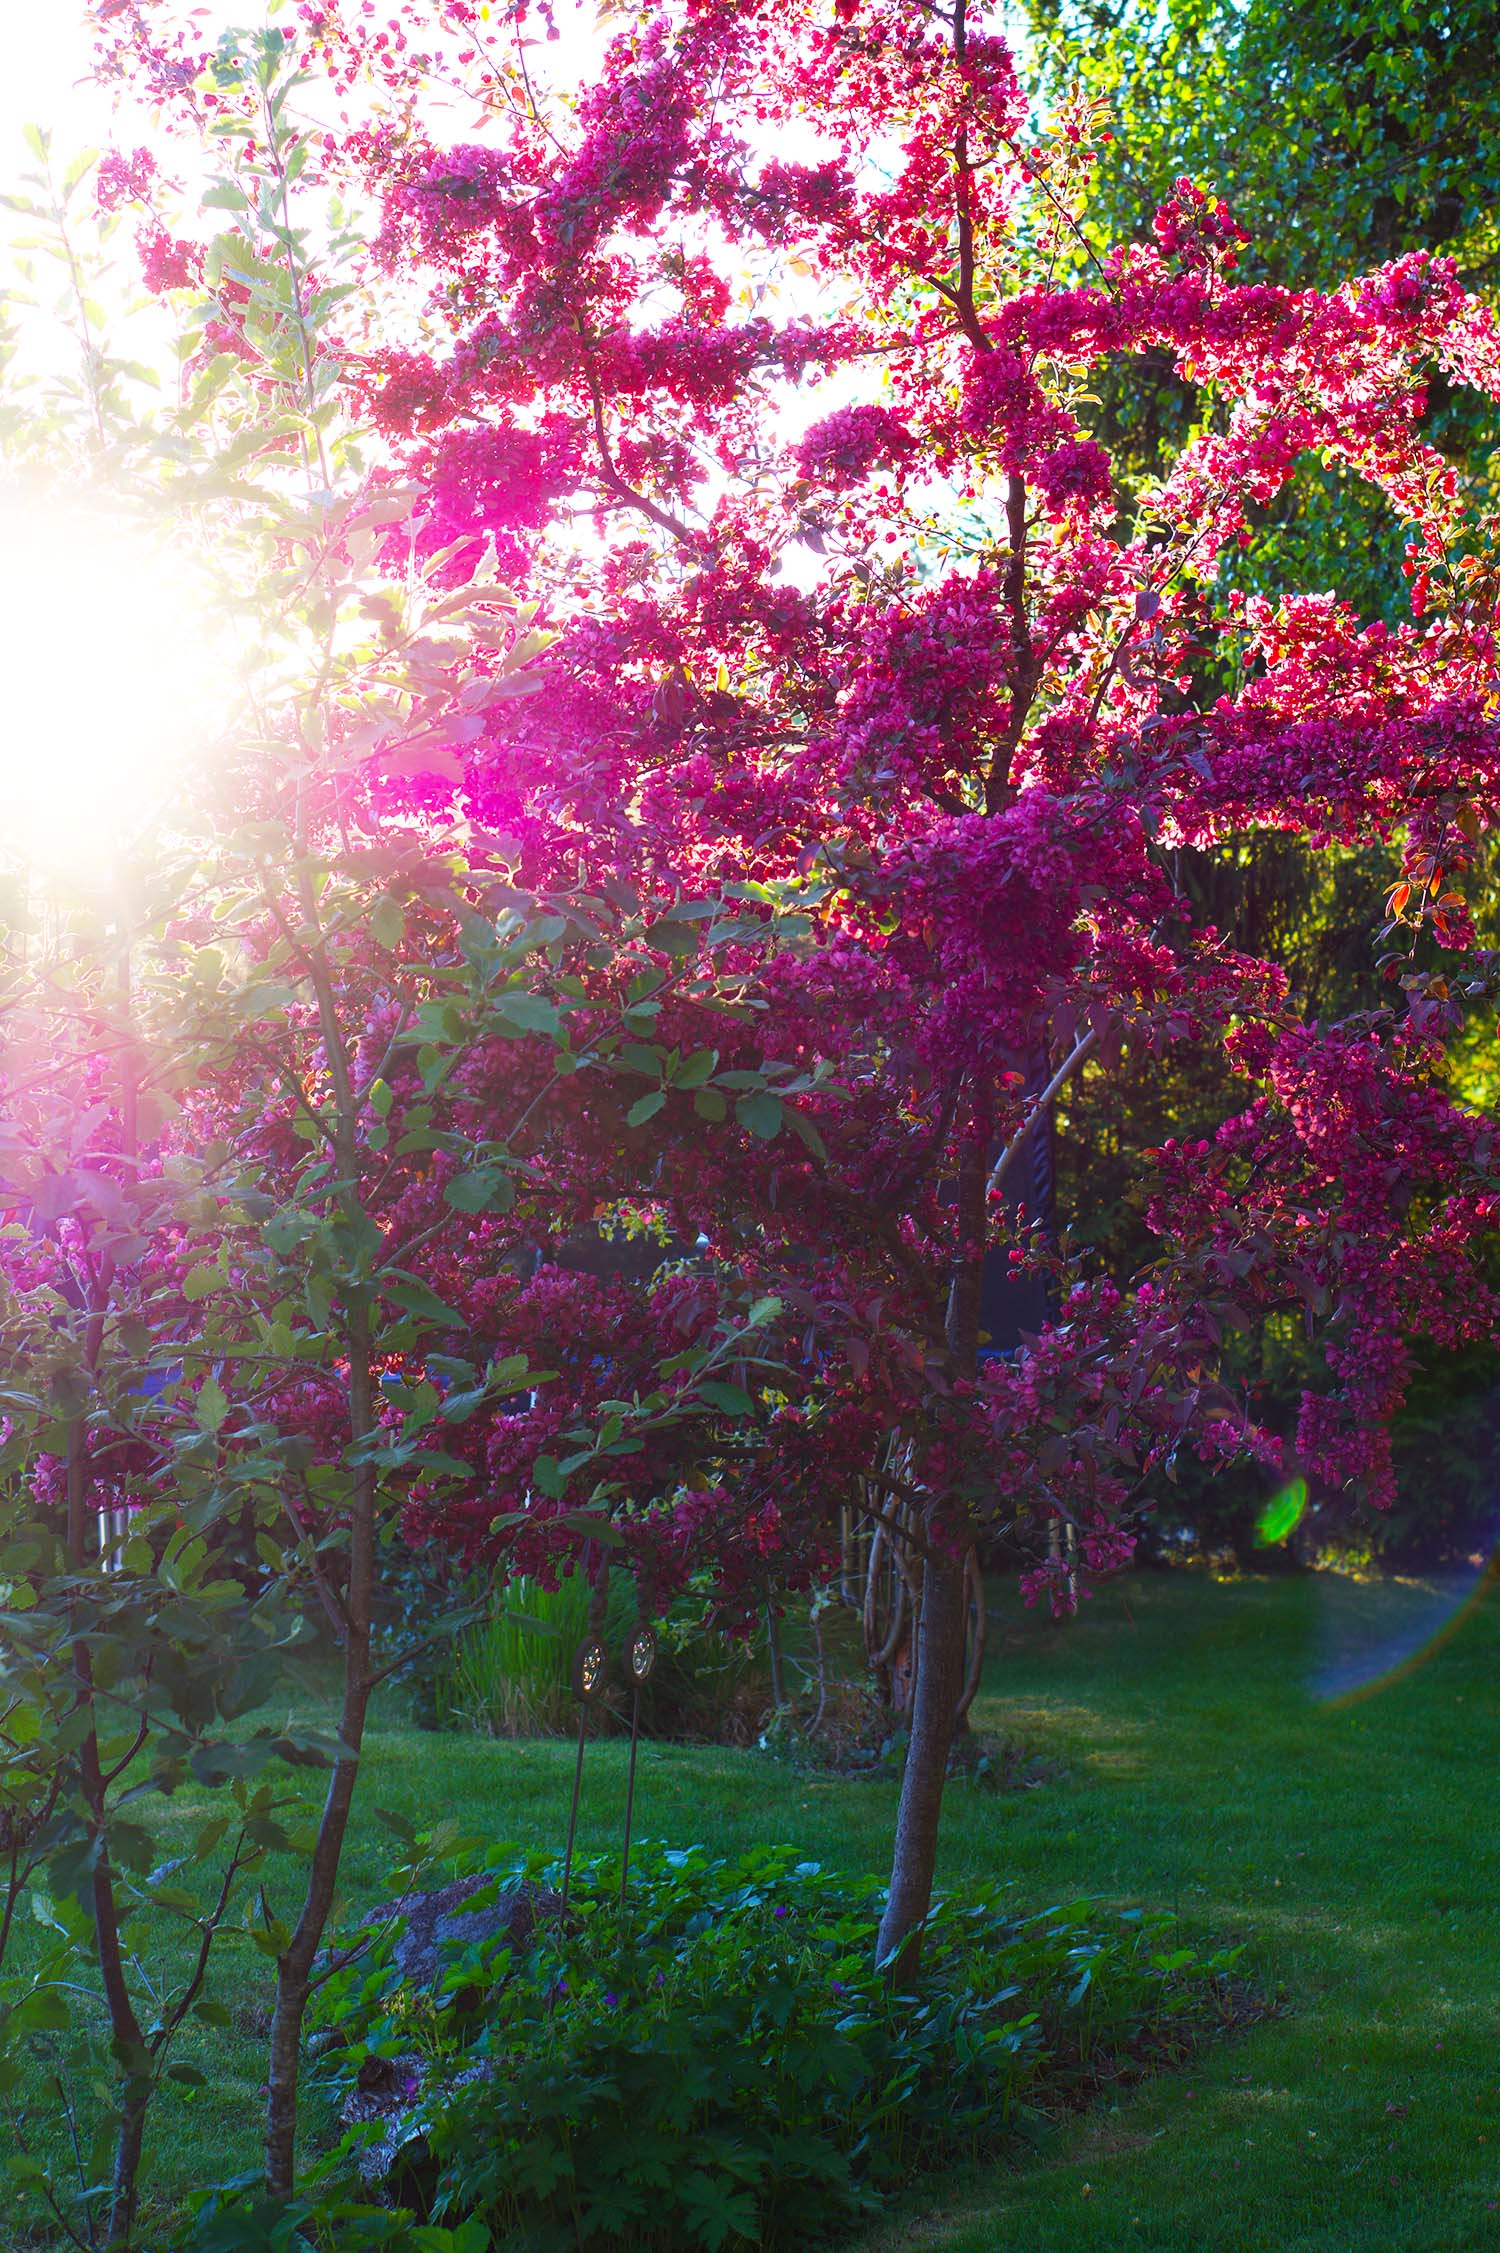 Purpurapel hemma hos oss